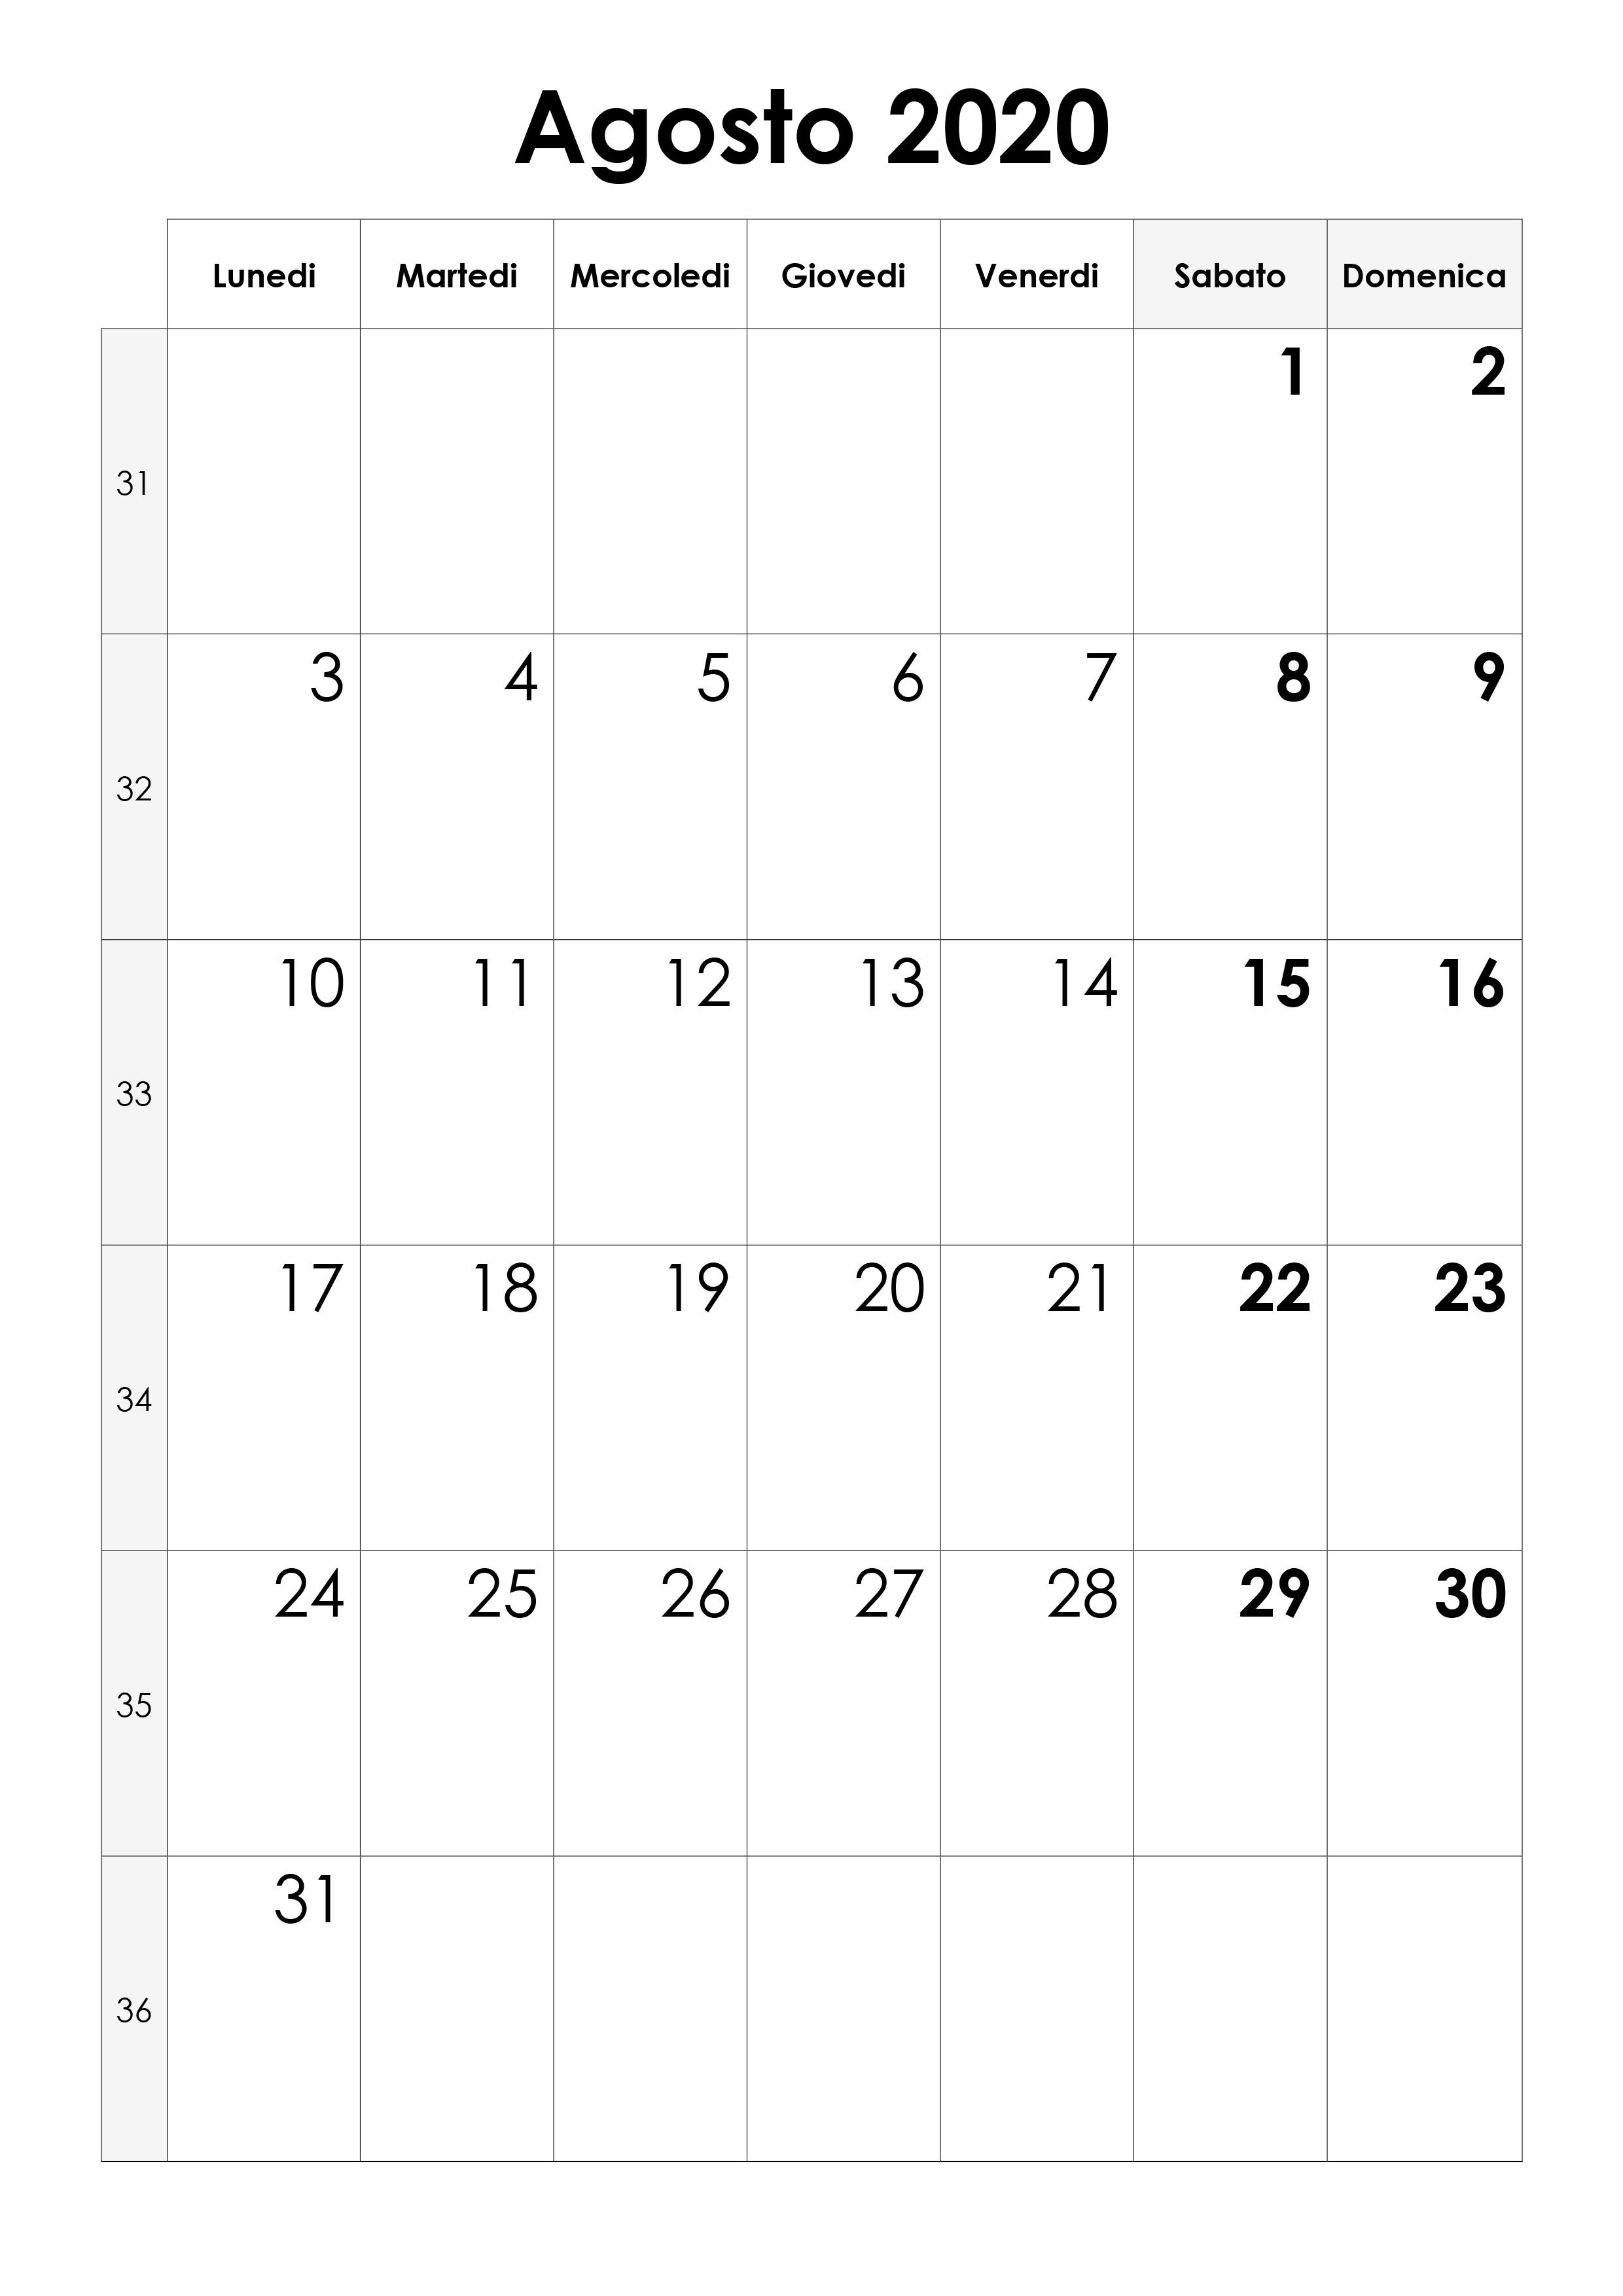 Agosto 2020 Calendario.Calendario Agosto 2020 Calendario Su